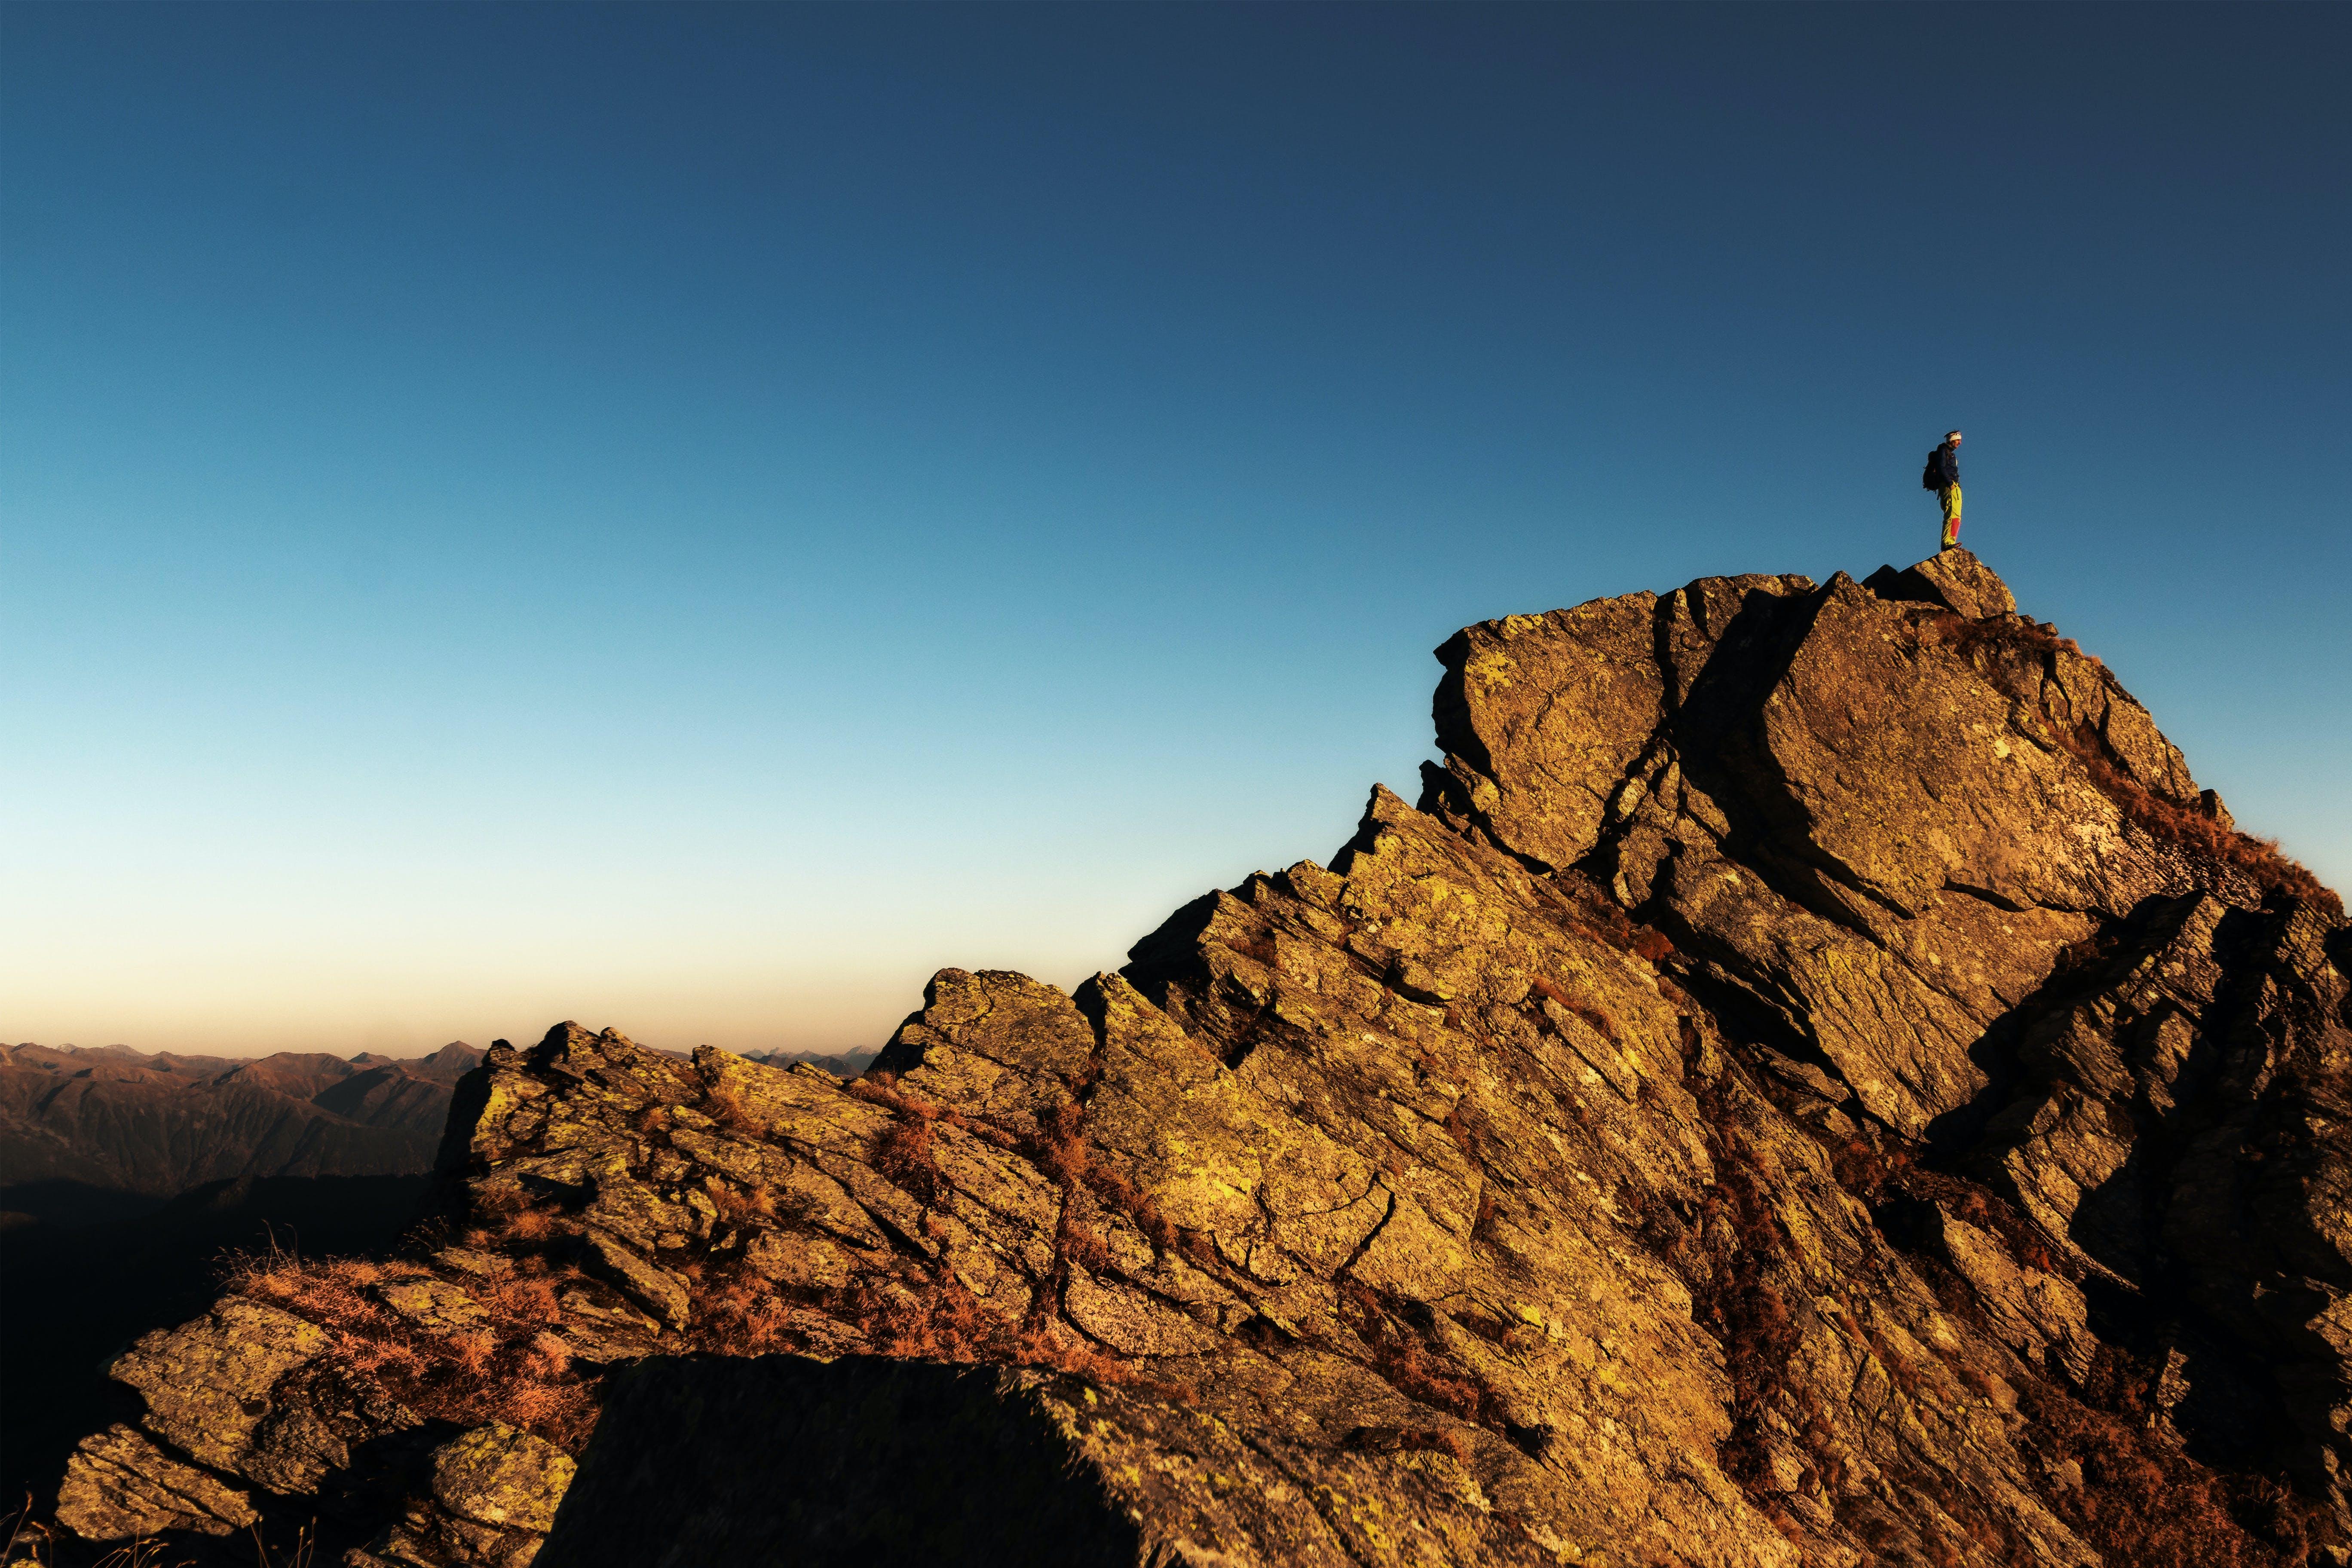 Gratis stockfoto met avontuur, beklimmen, berg, bergbeklimmen